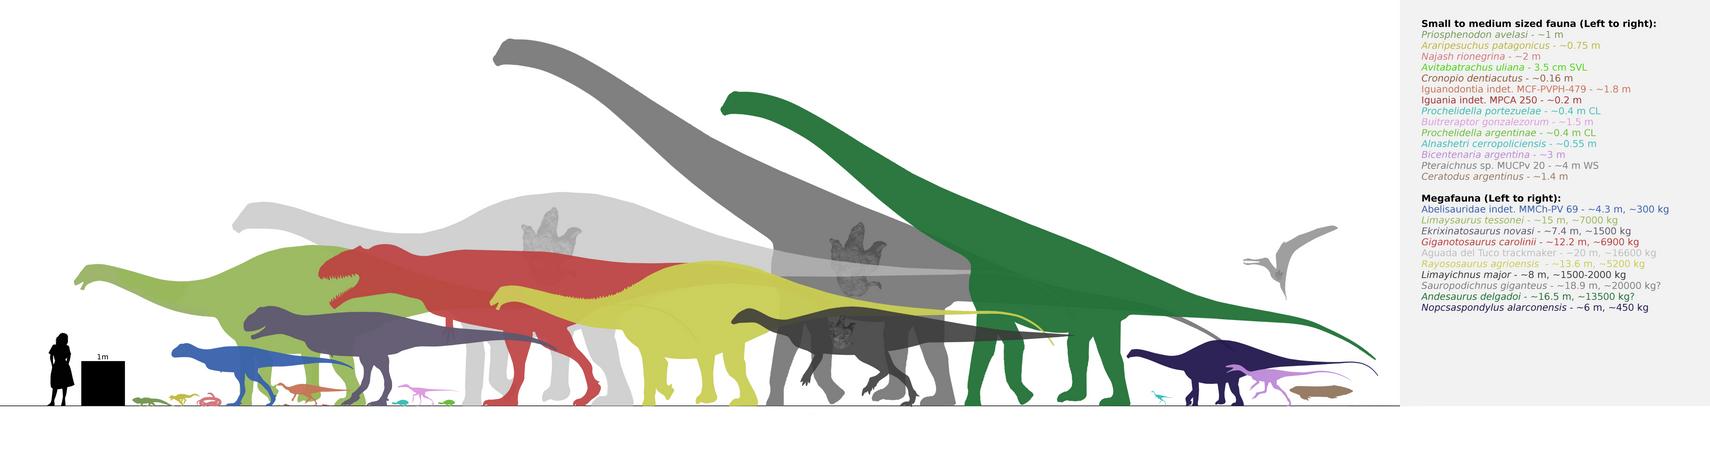 Candeleros Formation fauna